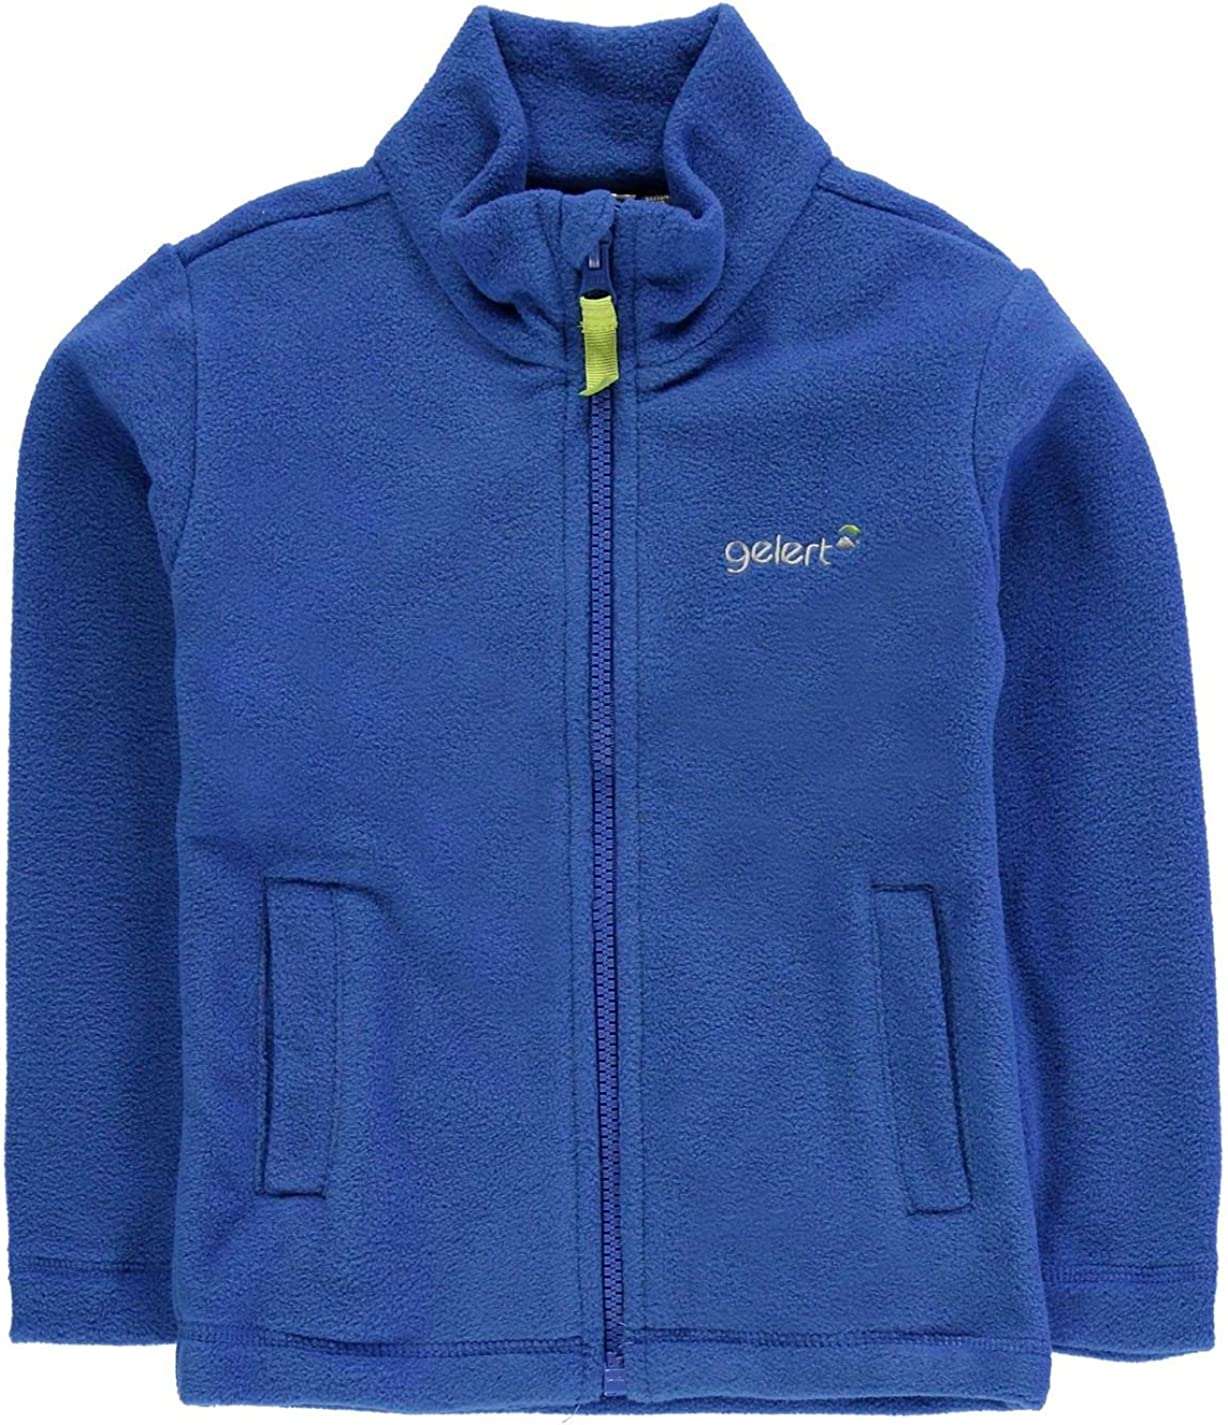 Gelert Girls Ottawa Fleece Jacket